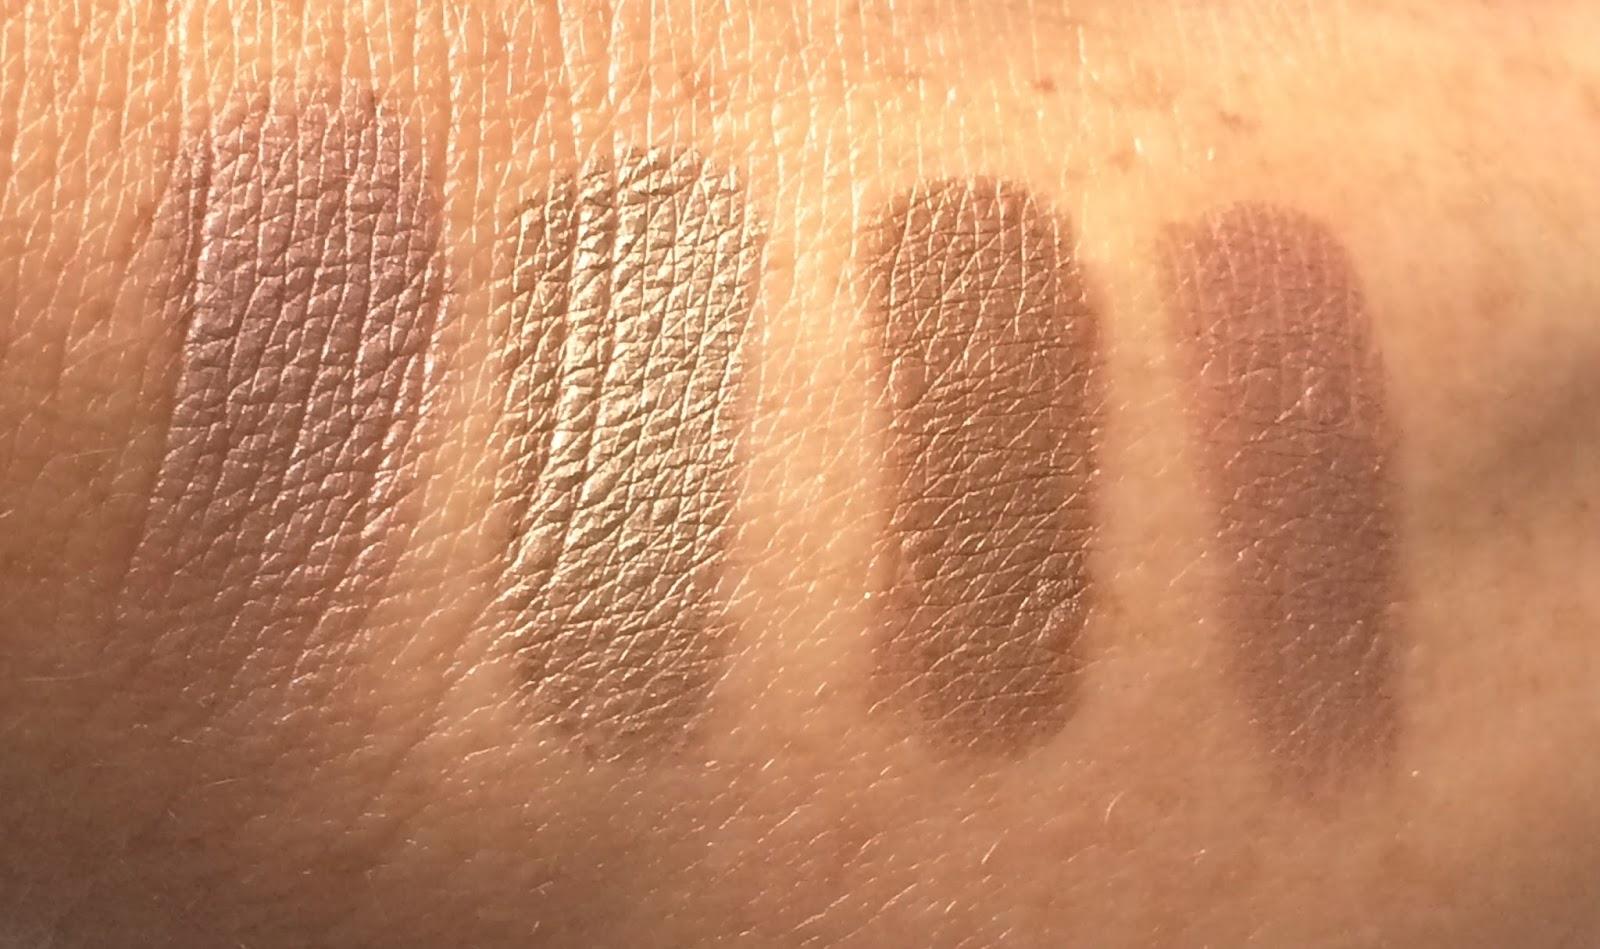 Anastasia Beverly Hills Single Eyeshadow Custom, Chiffon, Brownie, Chocolate Crumble swatches